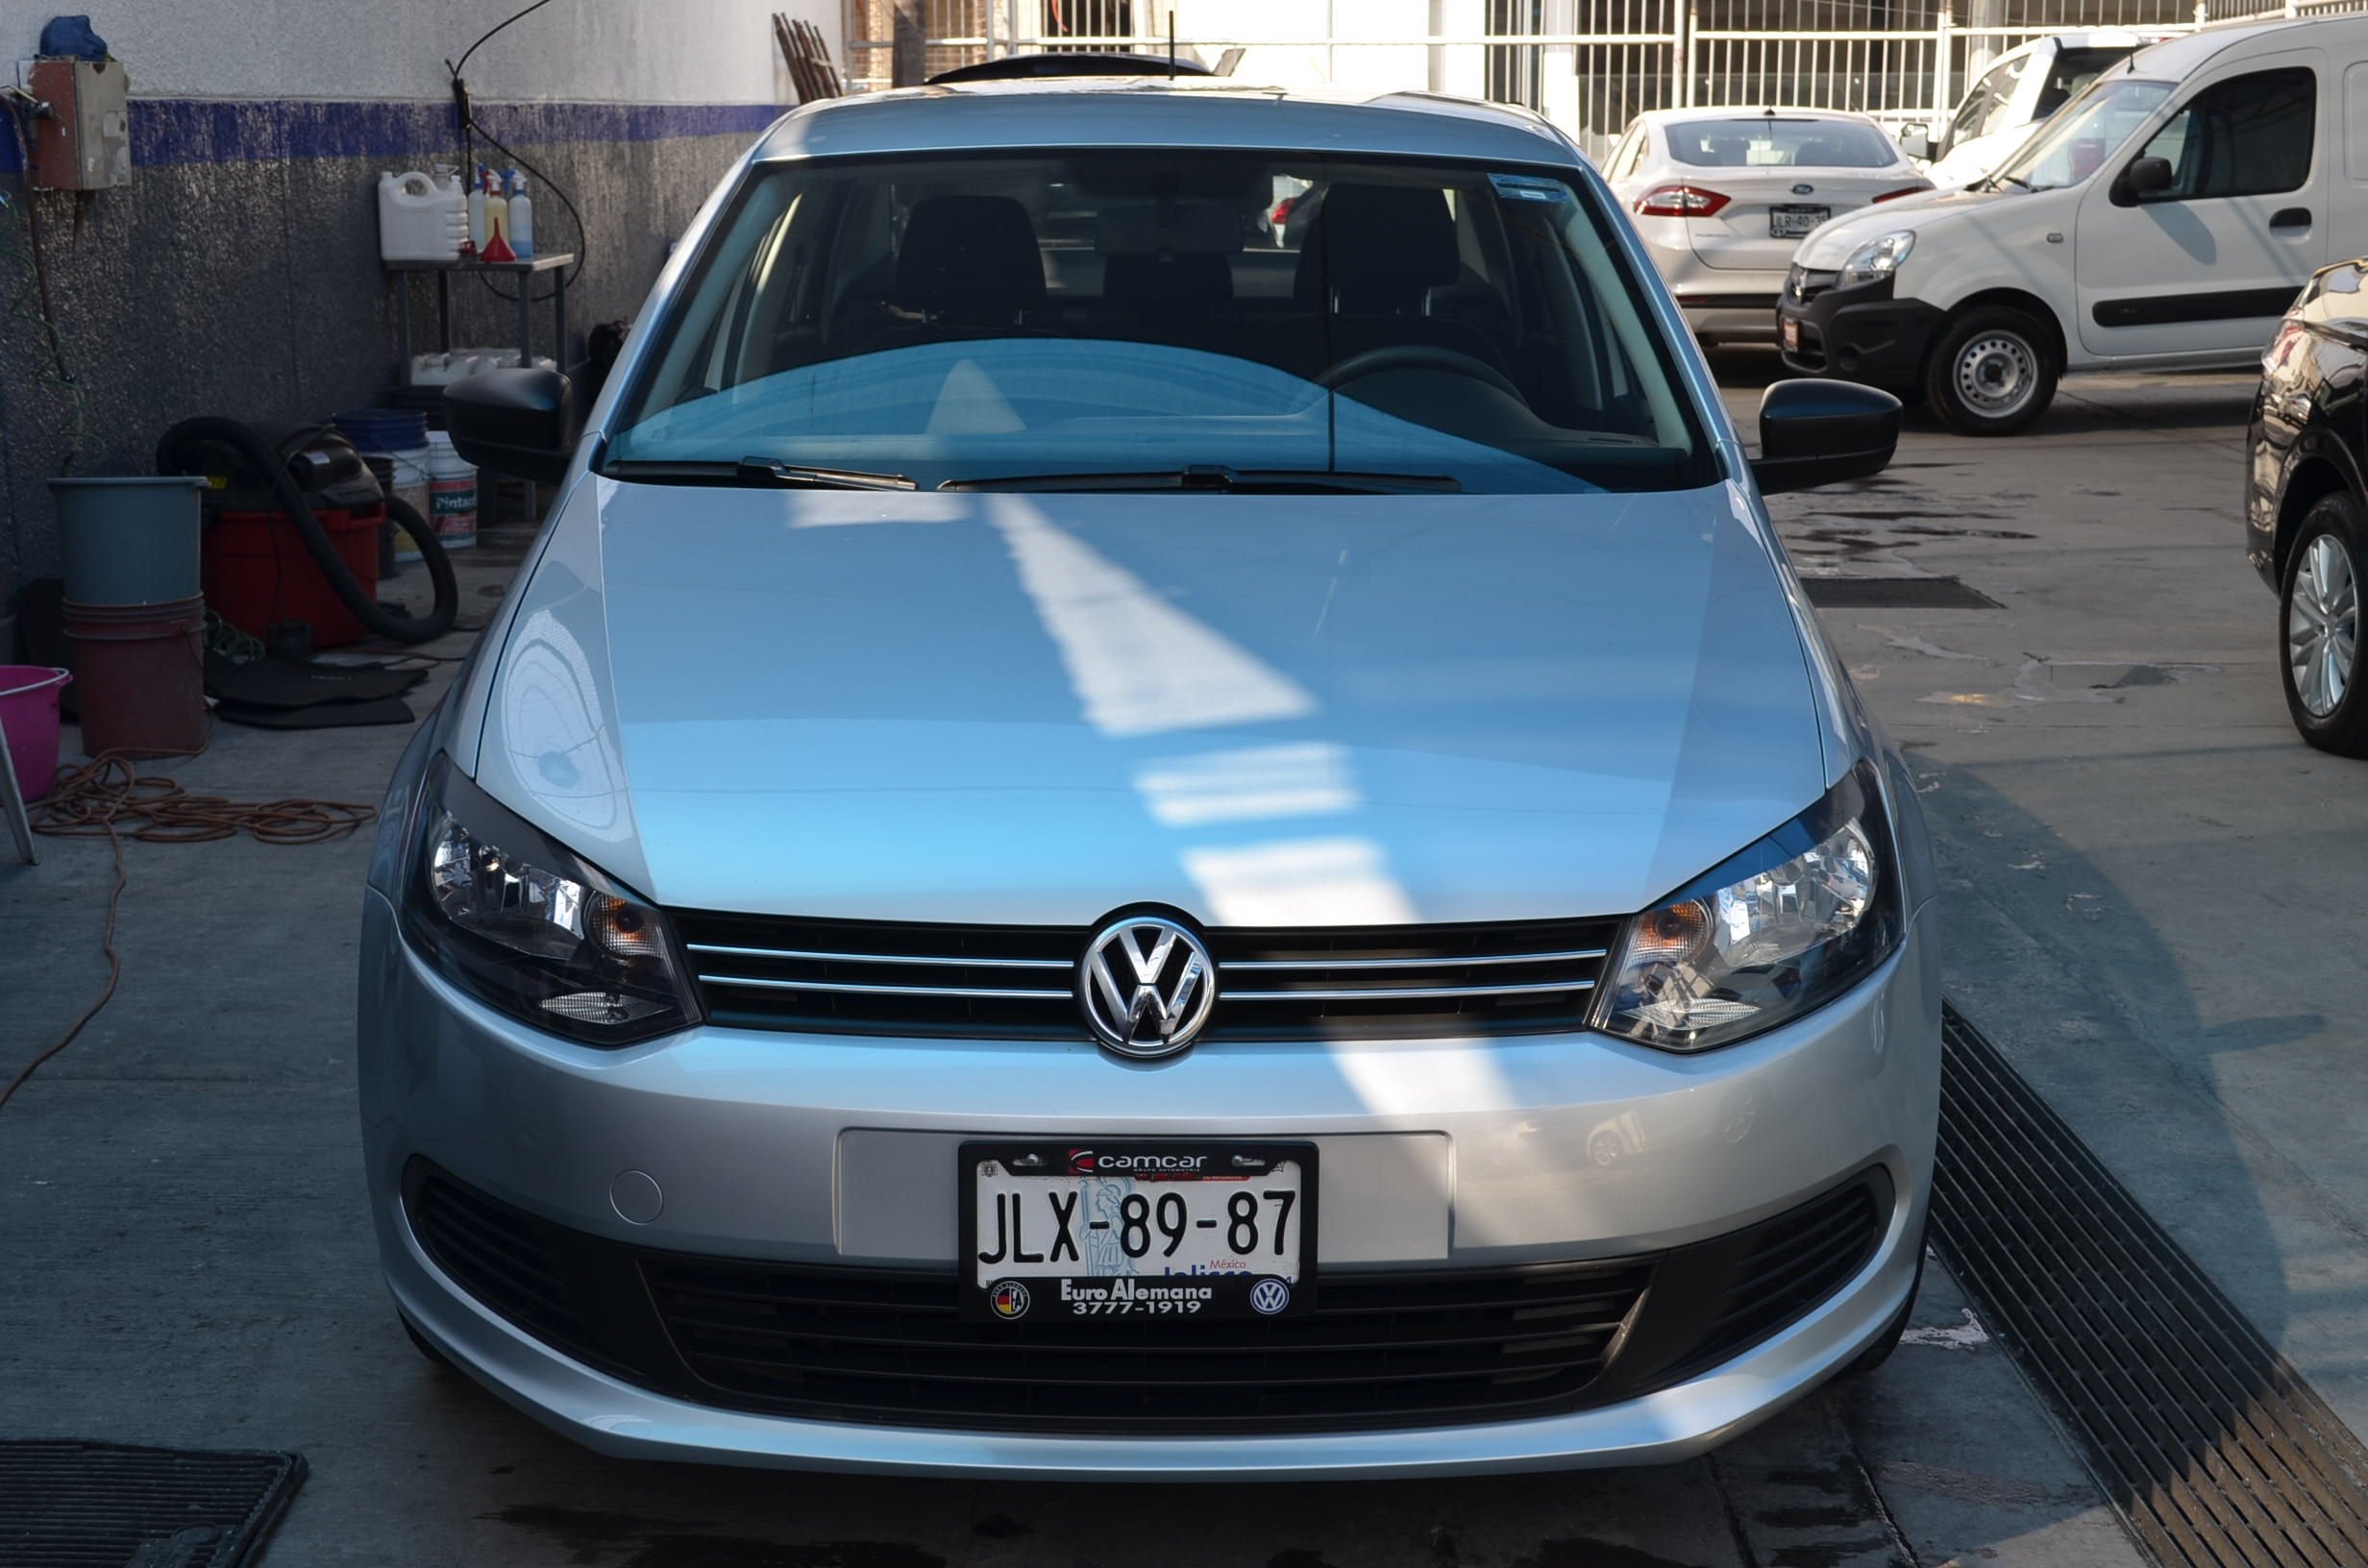 Volkswagen Vento Lateral derecho 6